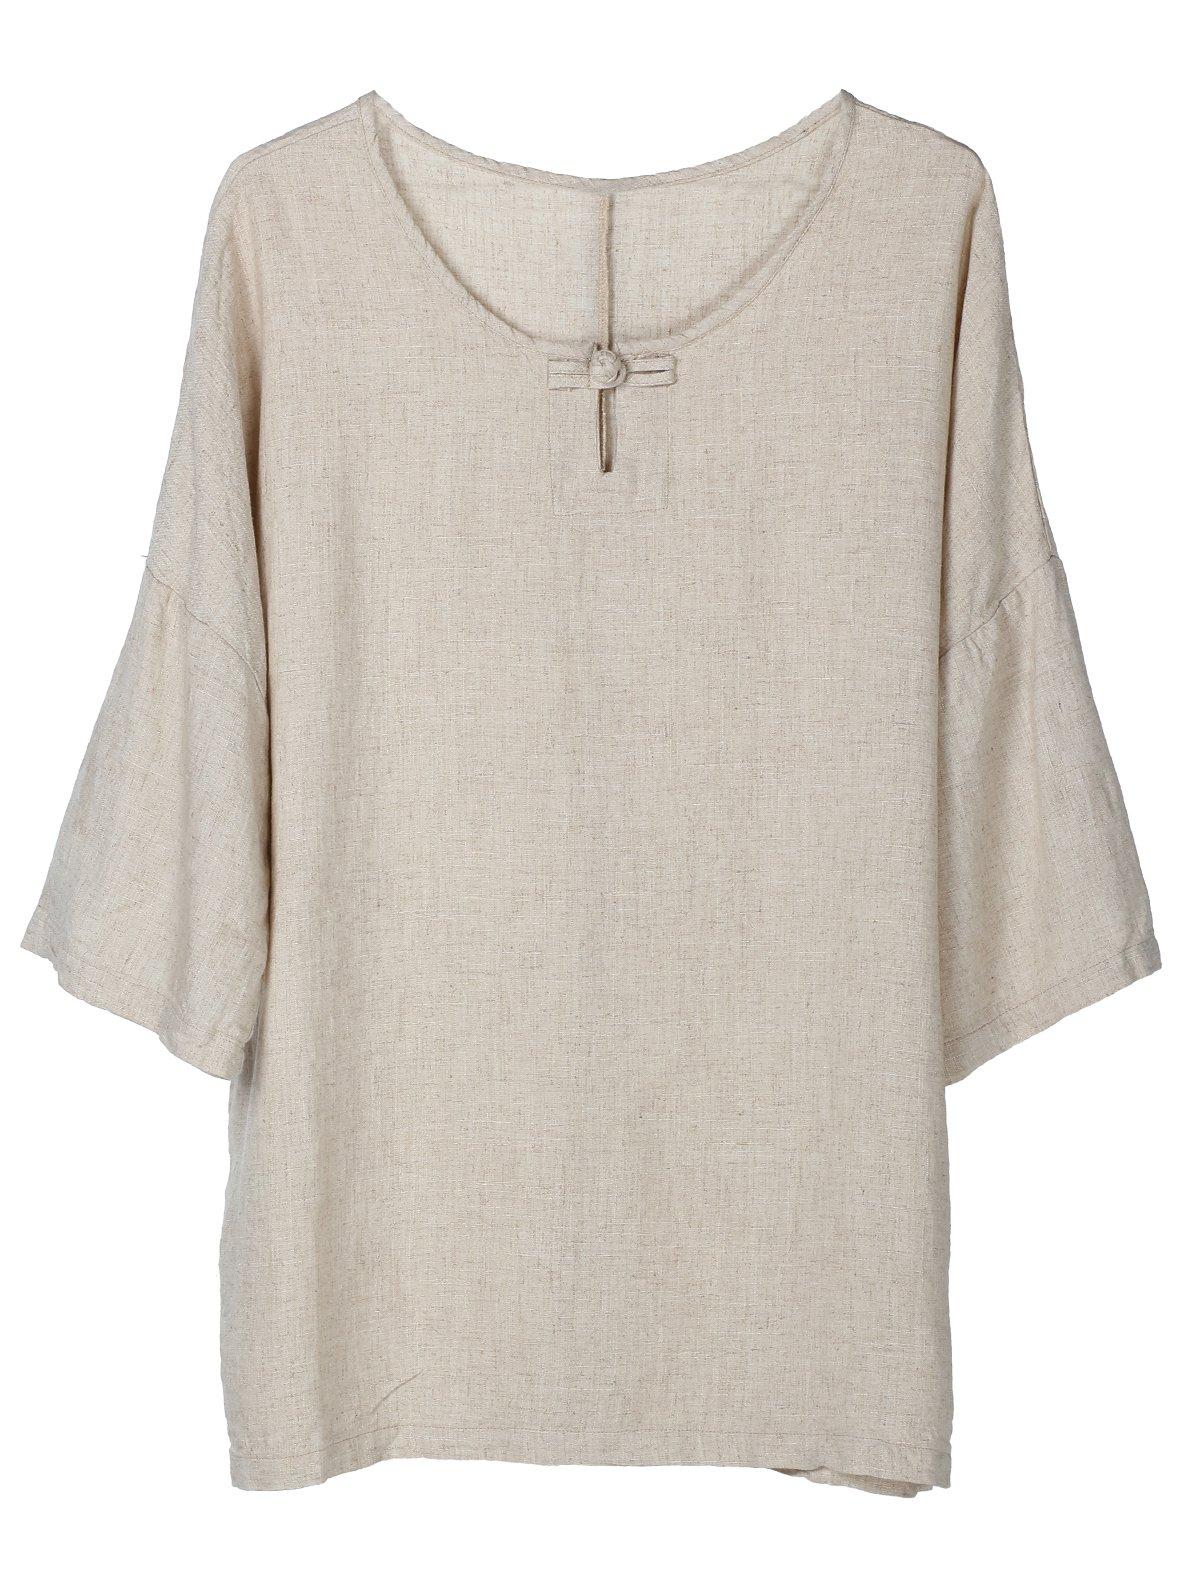 Minibee Women's Elbow Sleeve Linen Tunic Tops Solid Color Retro Blouse Linen 2XL